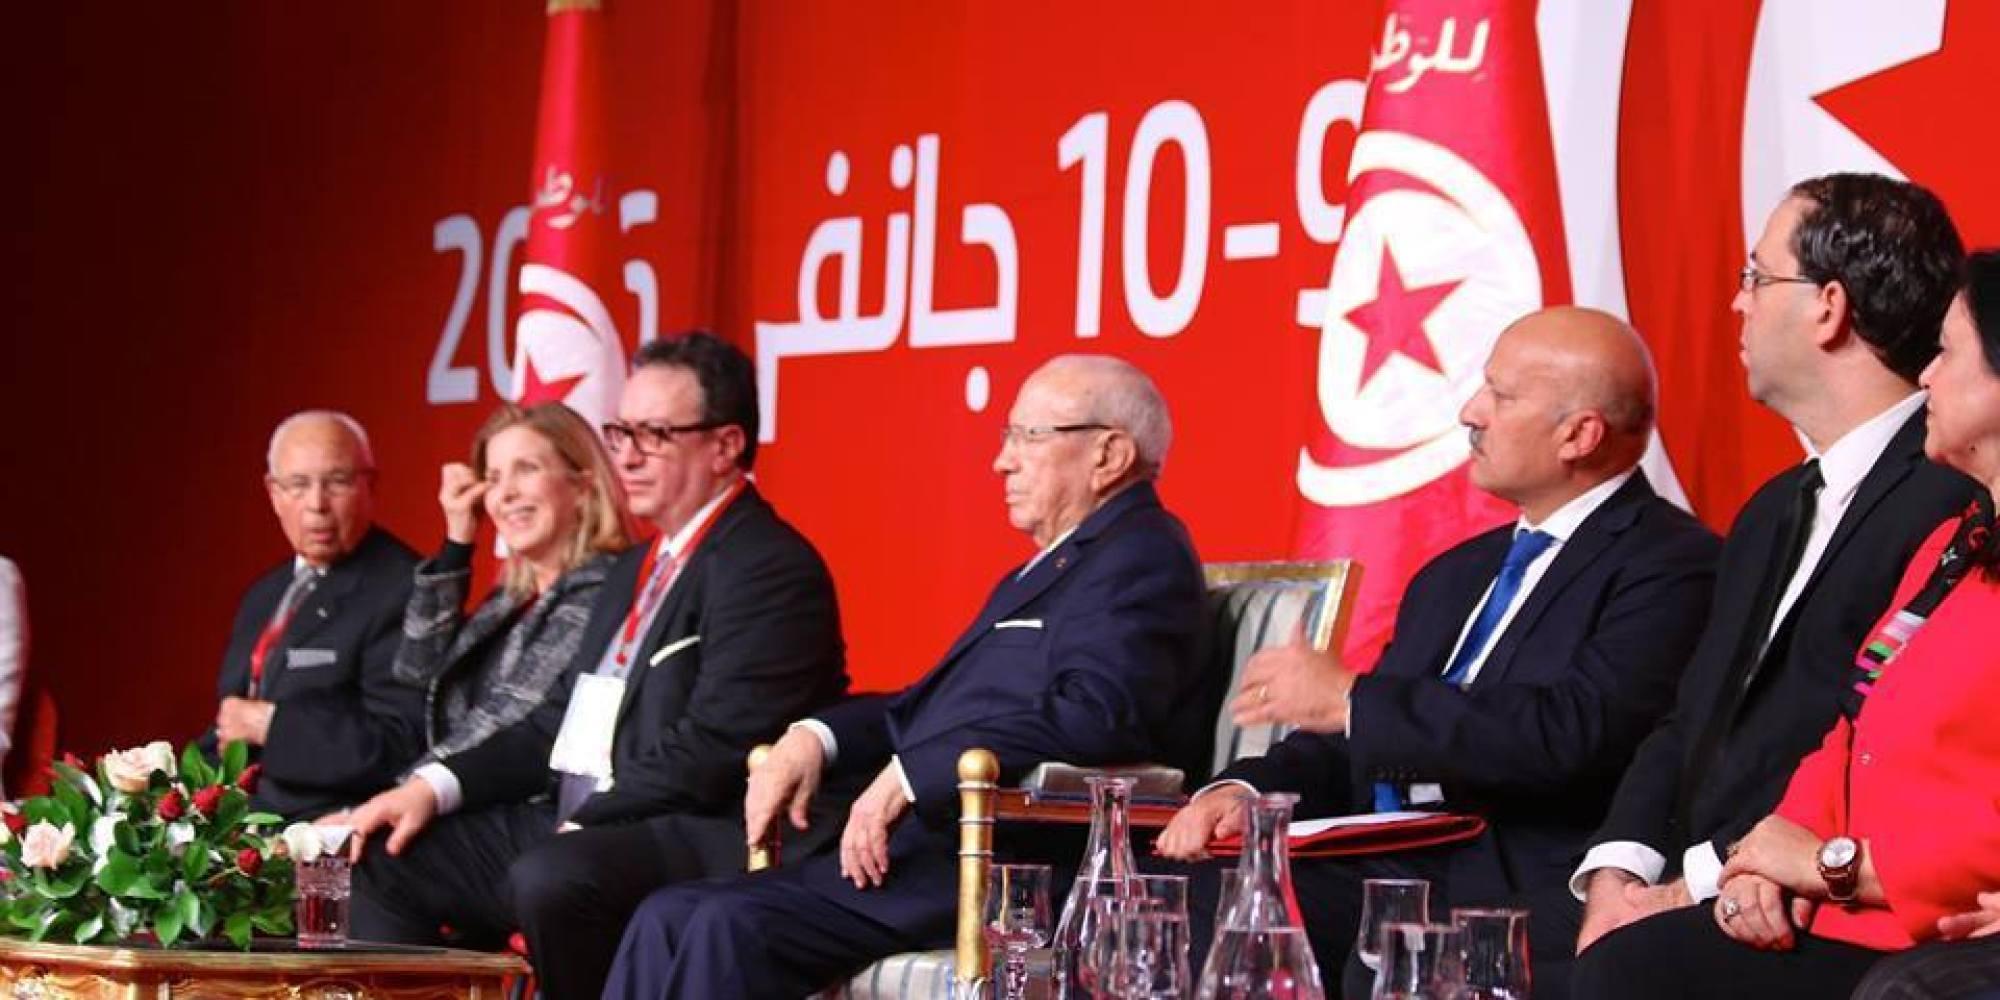 tunisie confusion au bureau politique de nidaa tounes apr s une r union du bureau politique. Black Bedroom Furniture Sets. Home Design Ideas